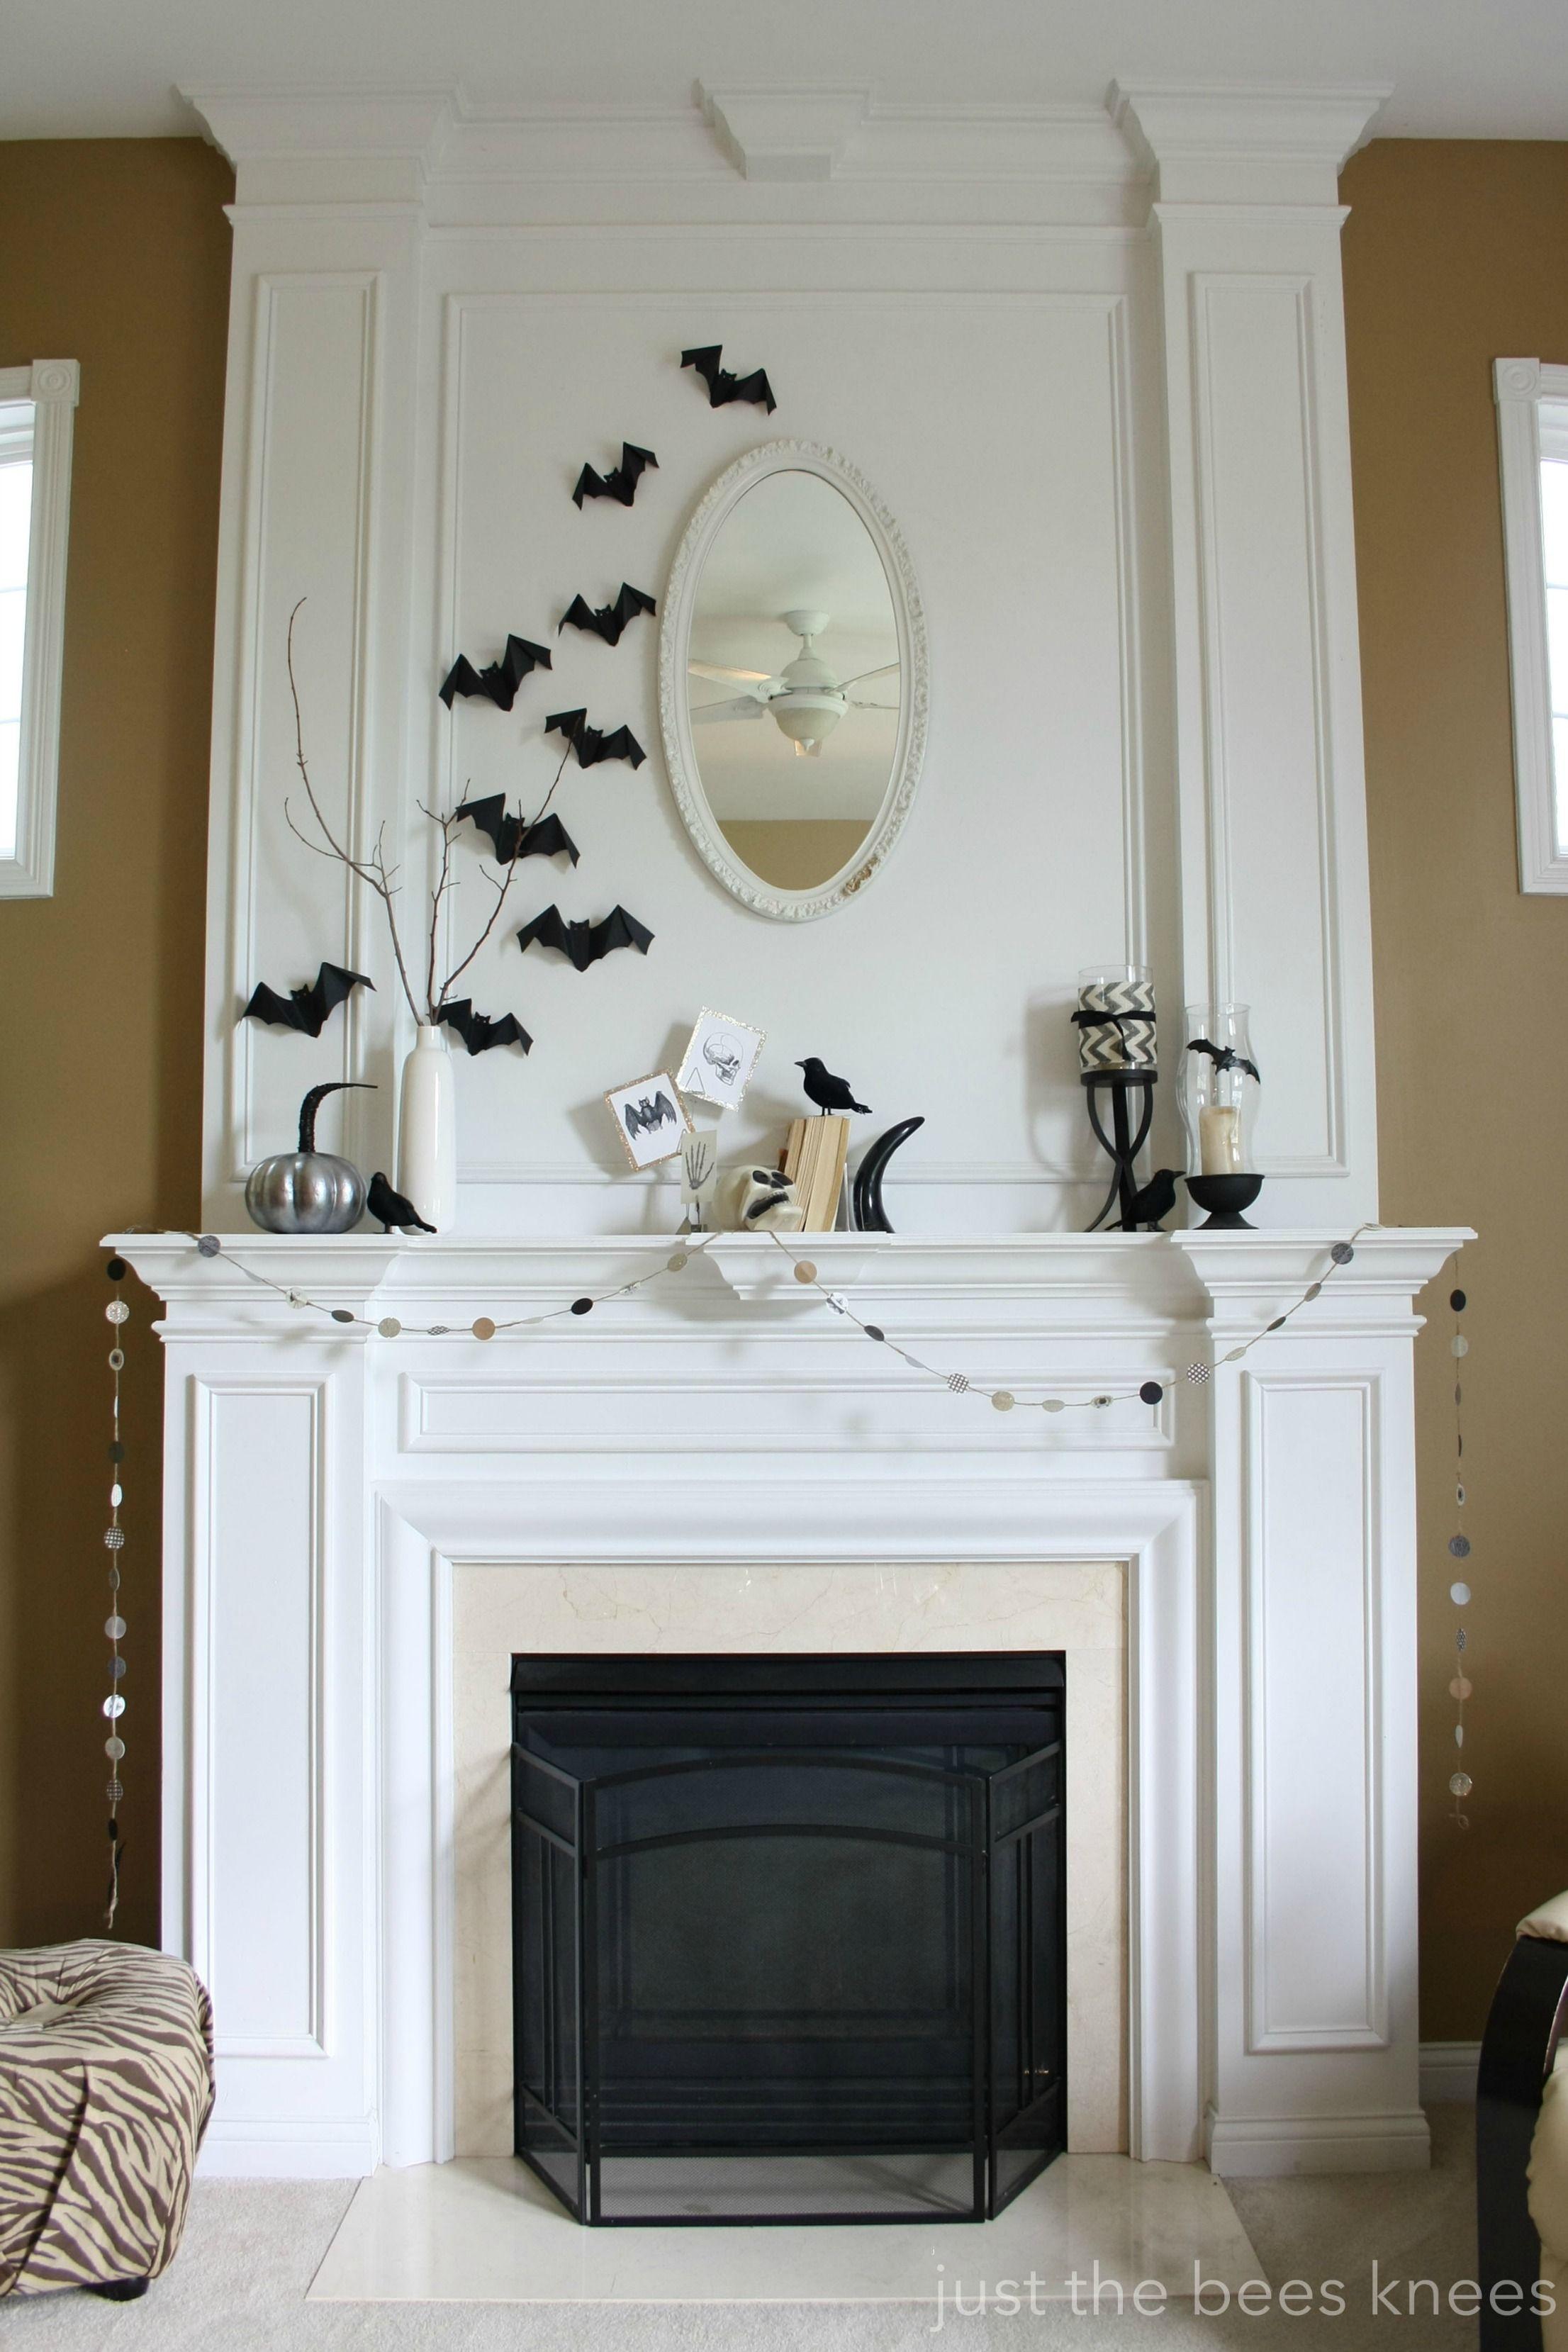 Stylish Halloween Decorations | DIY Home Decor | Pinterest | Stylish ...